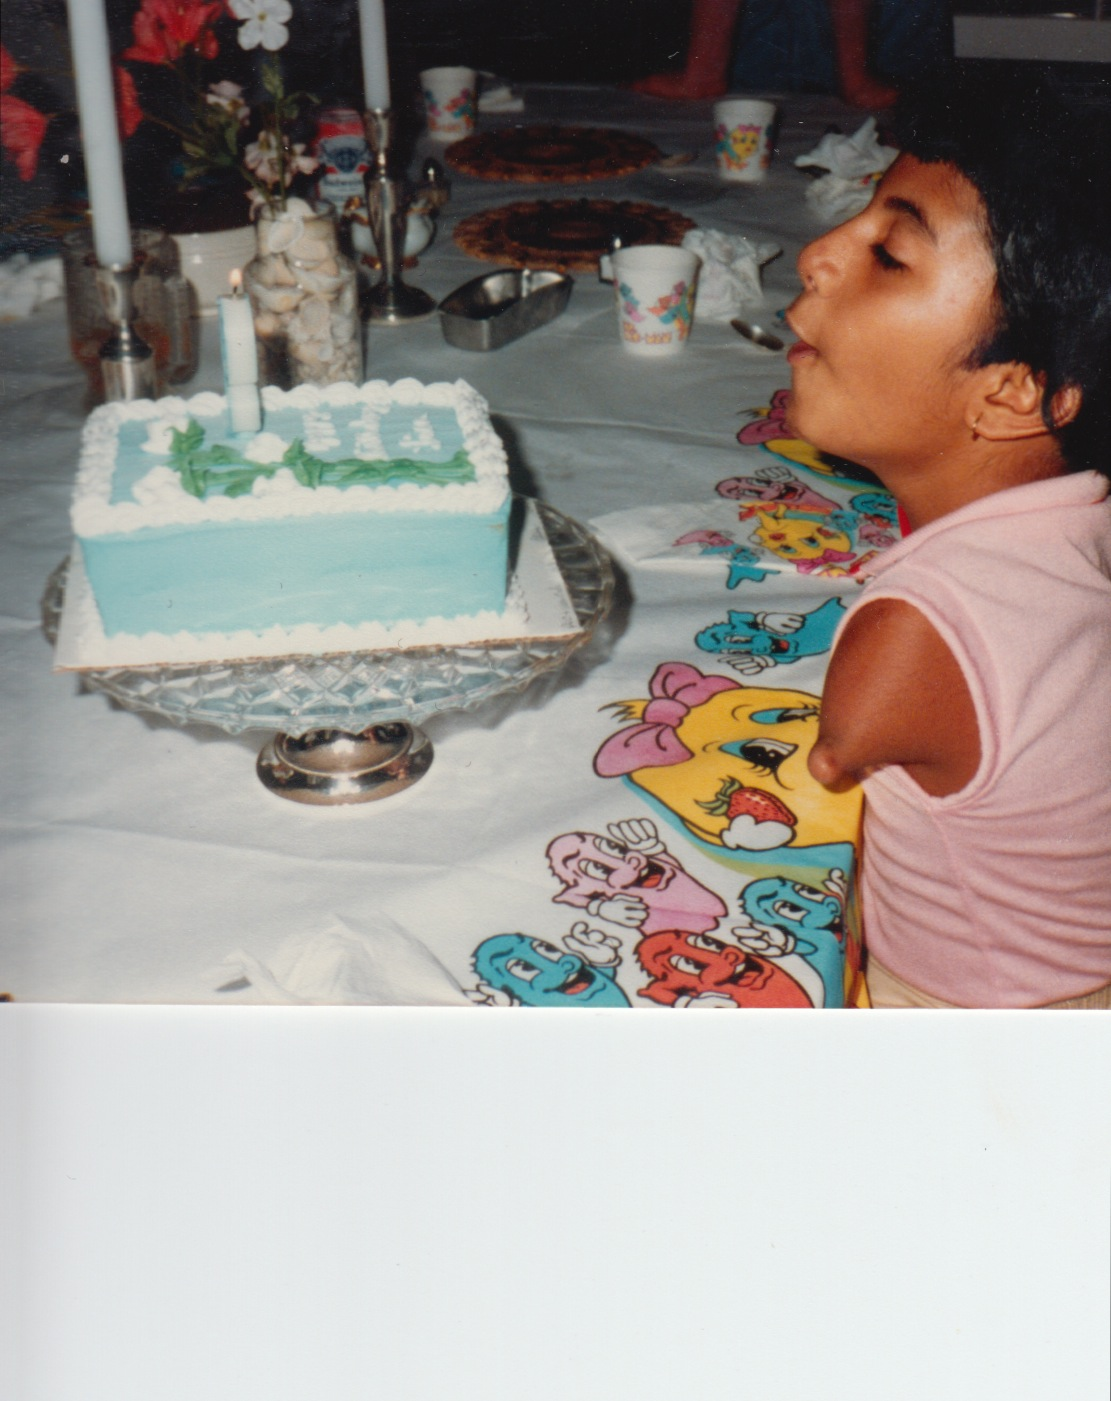 27 - lisa bday cake 1